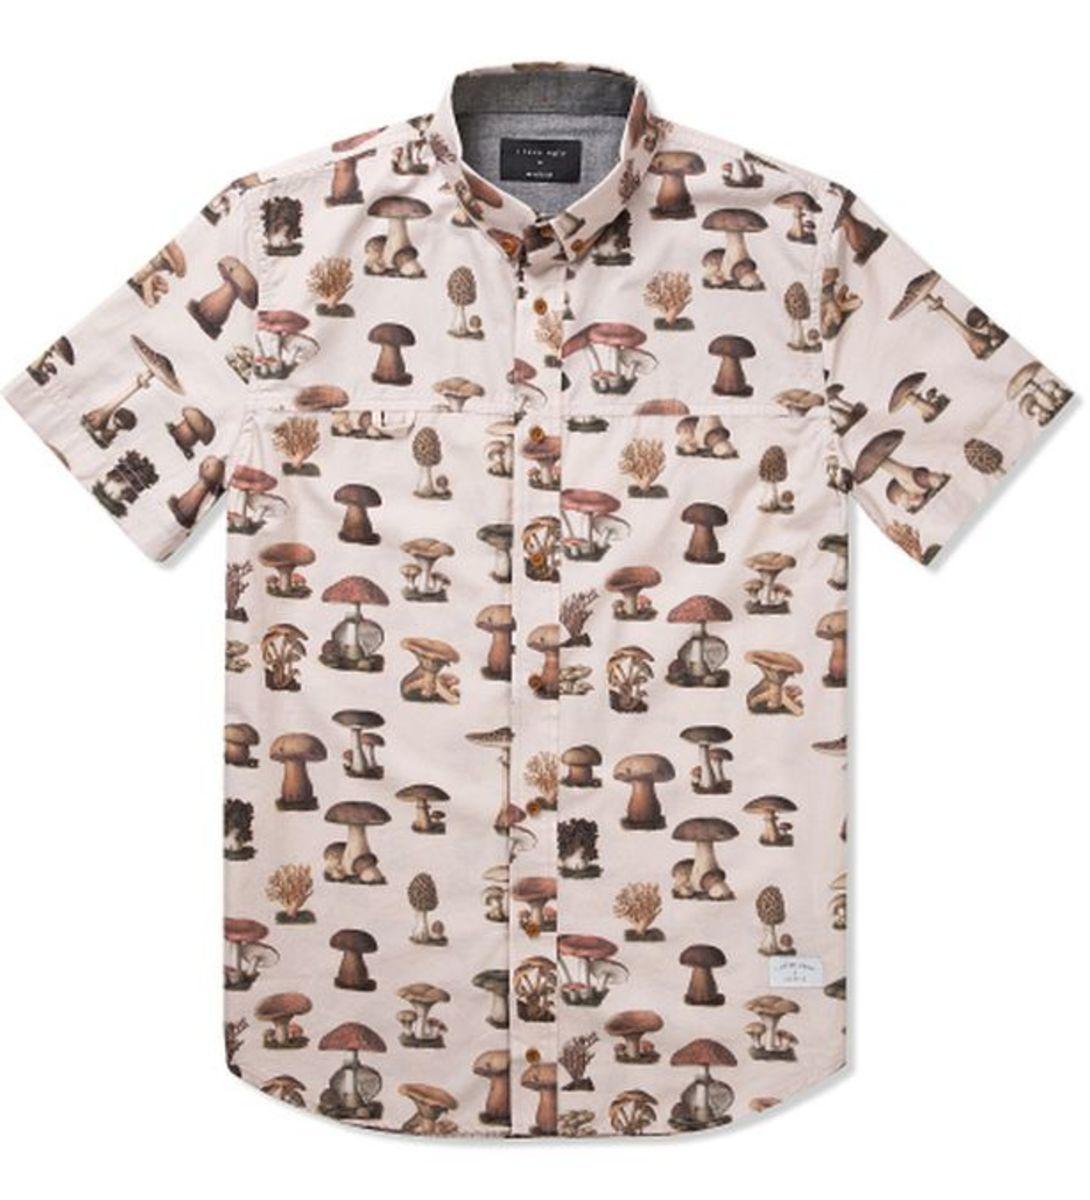 EDM Culture: I Love Ugly's Frankie Mushroom Short Sleeve Shirt